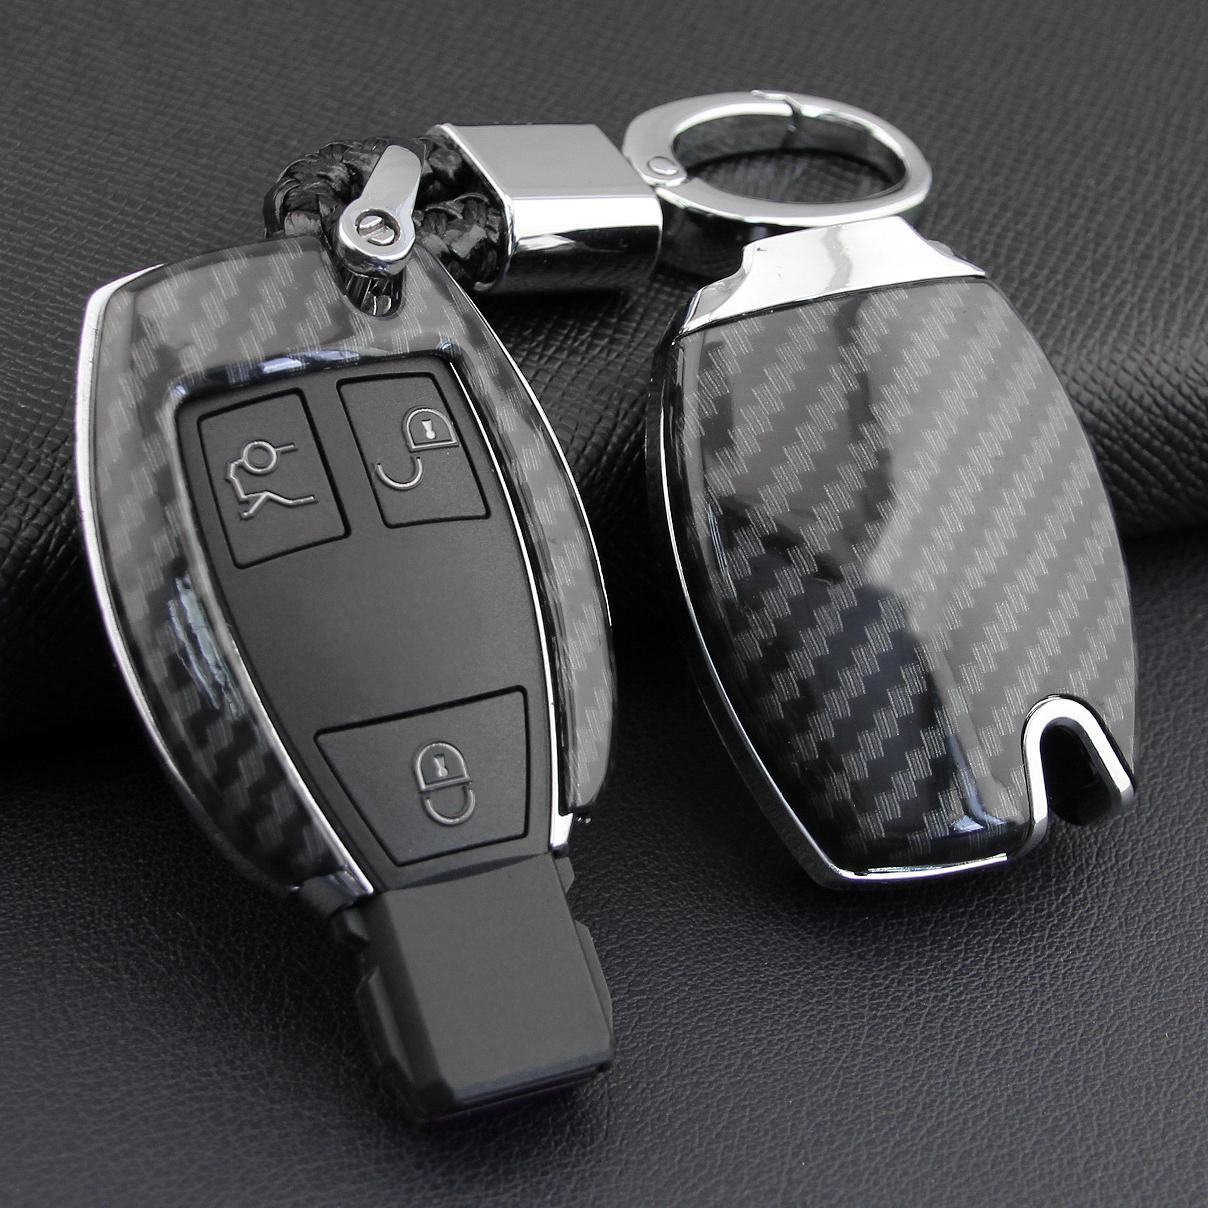 Chave de Chave de Corrente de Chave de Fibra Fibra de Carbono FOB FOB para Mercedes-Benz W205 W212 X253 W176 W246 W204 W222 W463 X156